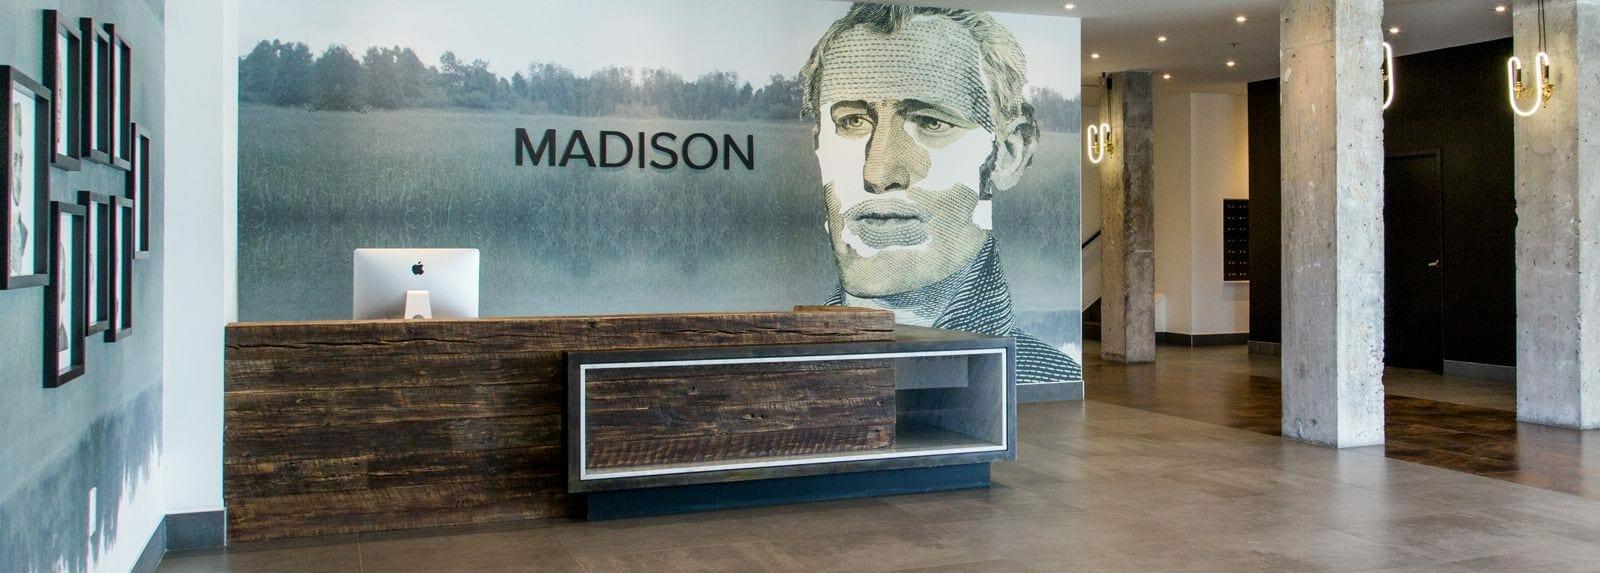 presidential city madison reception desk hero